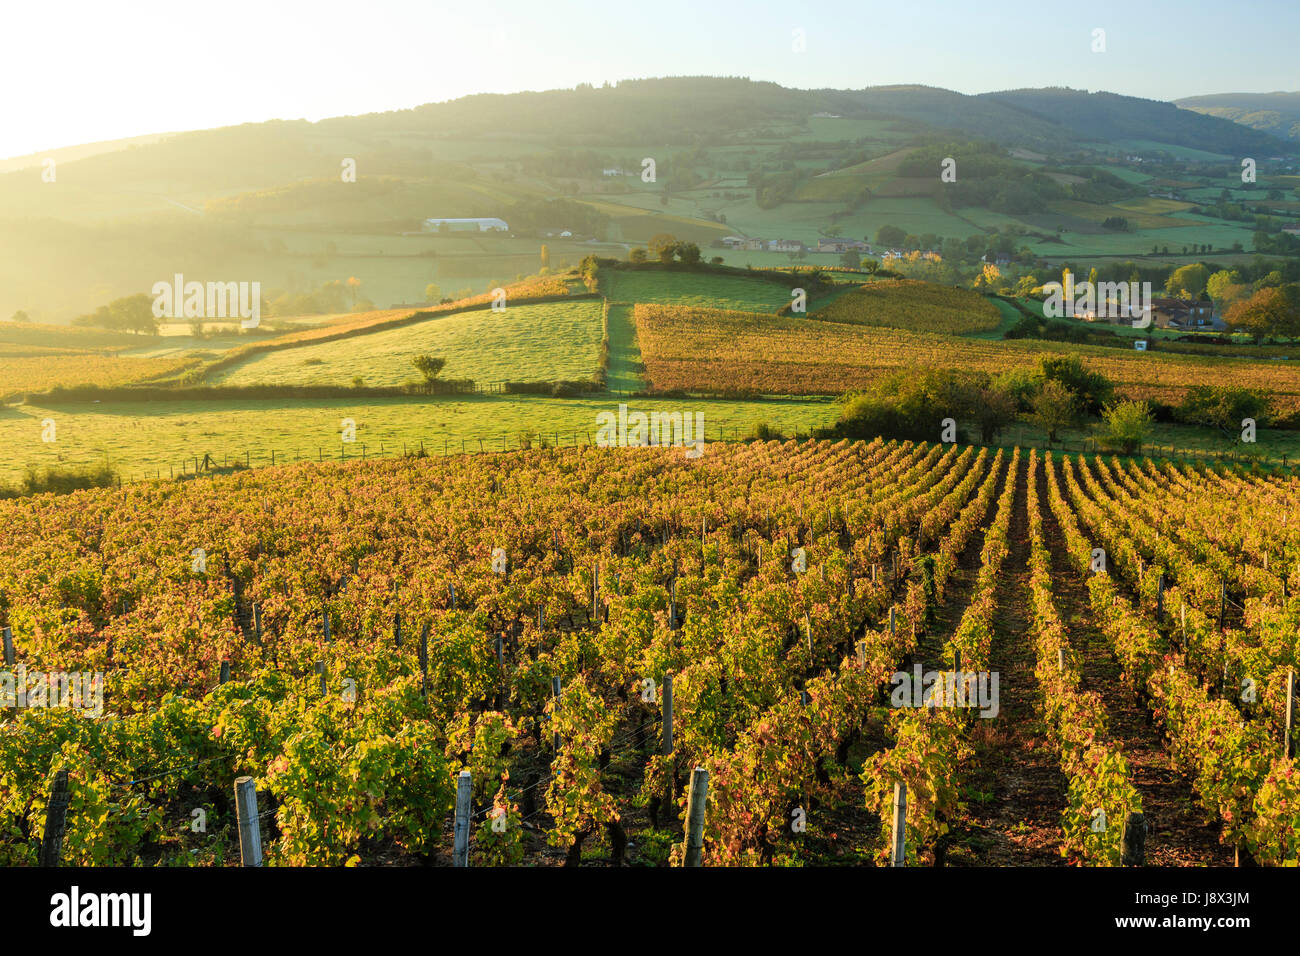 France, Saone et Loire, Pierreclos, vineyard fall - Stock Image